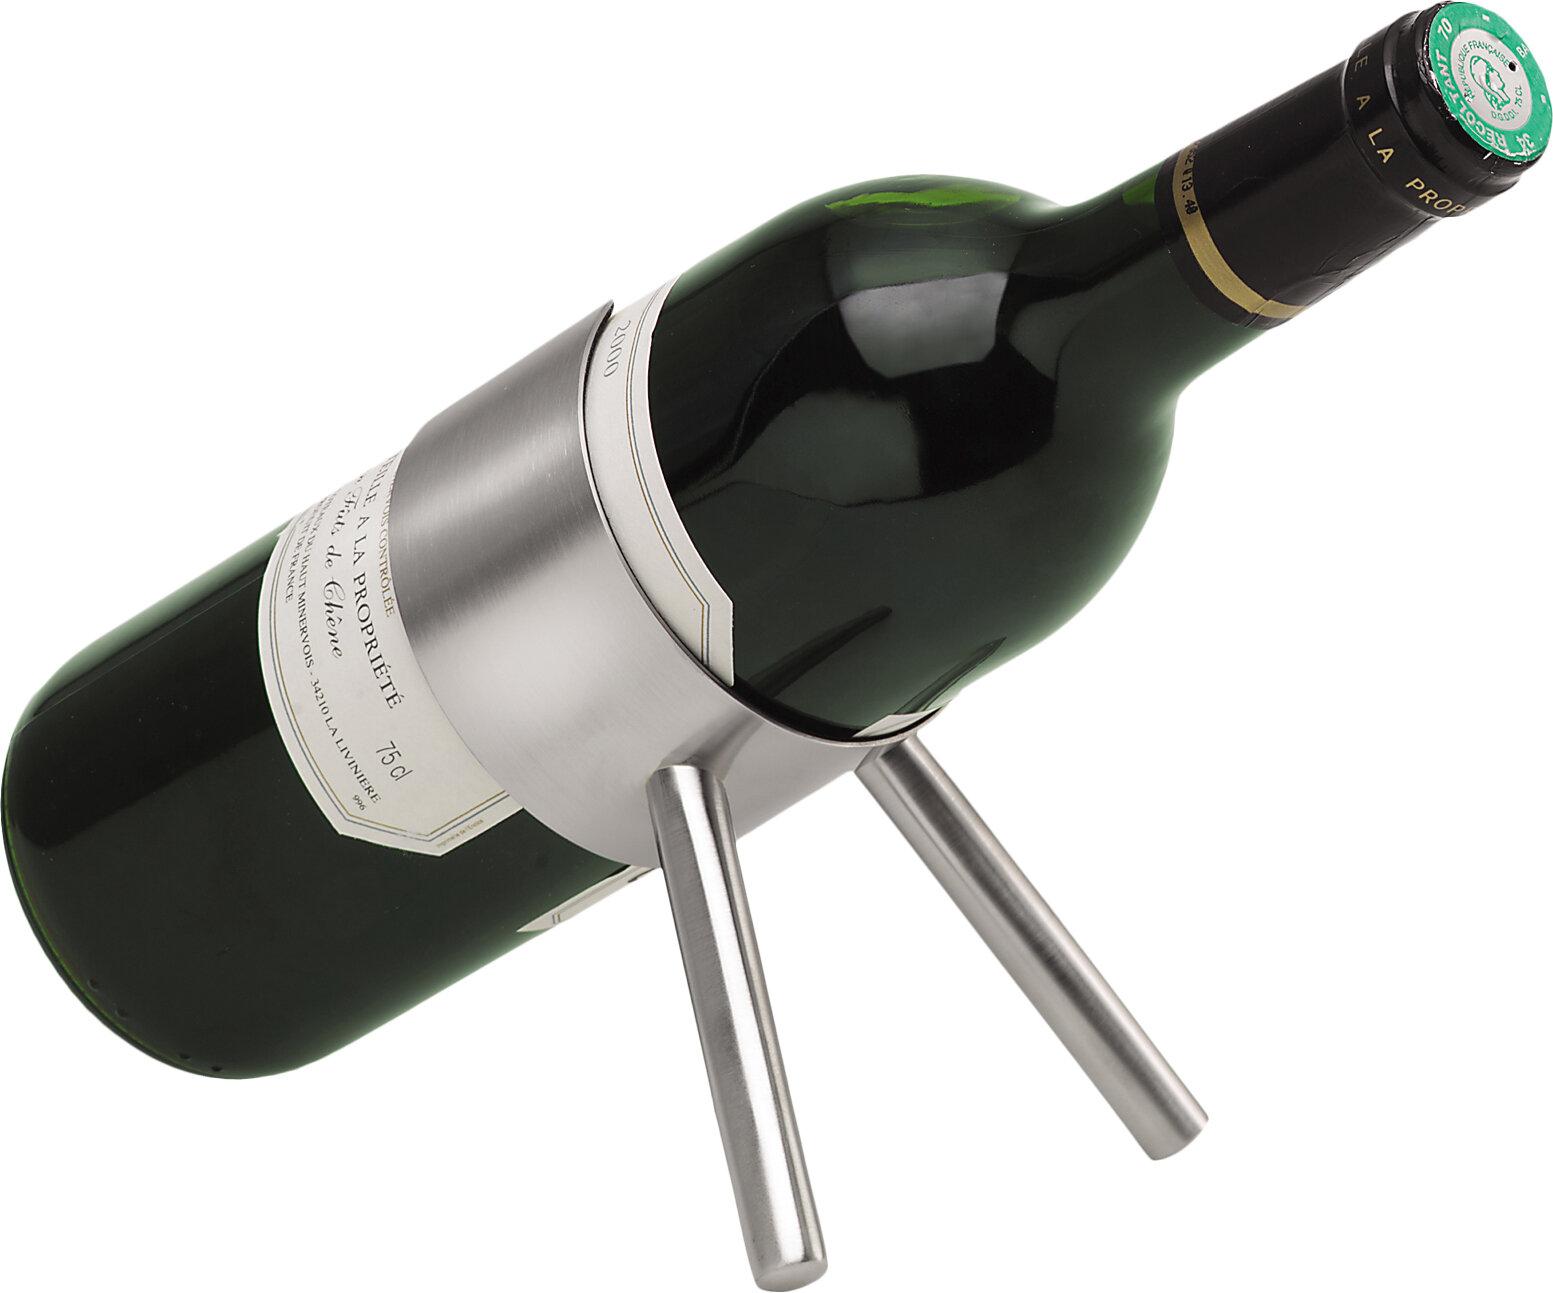 Cino 1 Bottle Tabletop Wine Rack Reviews Allmodern